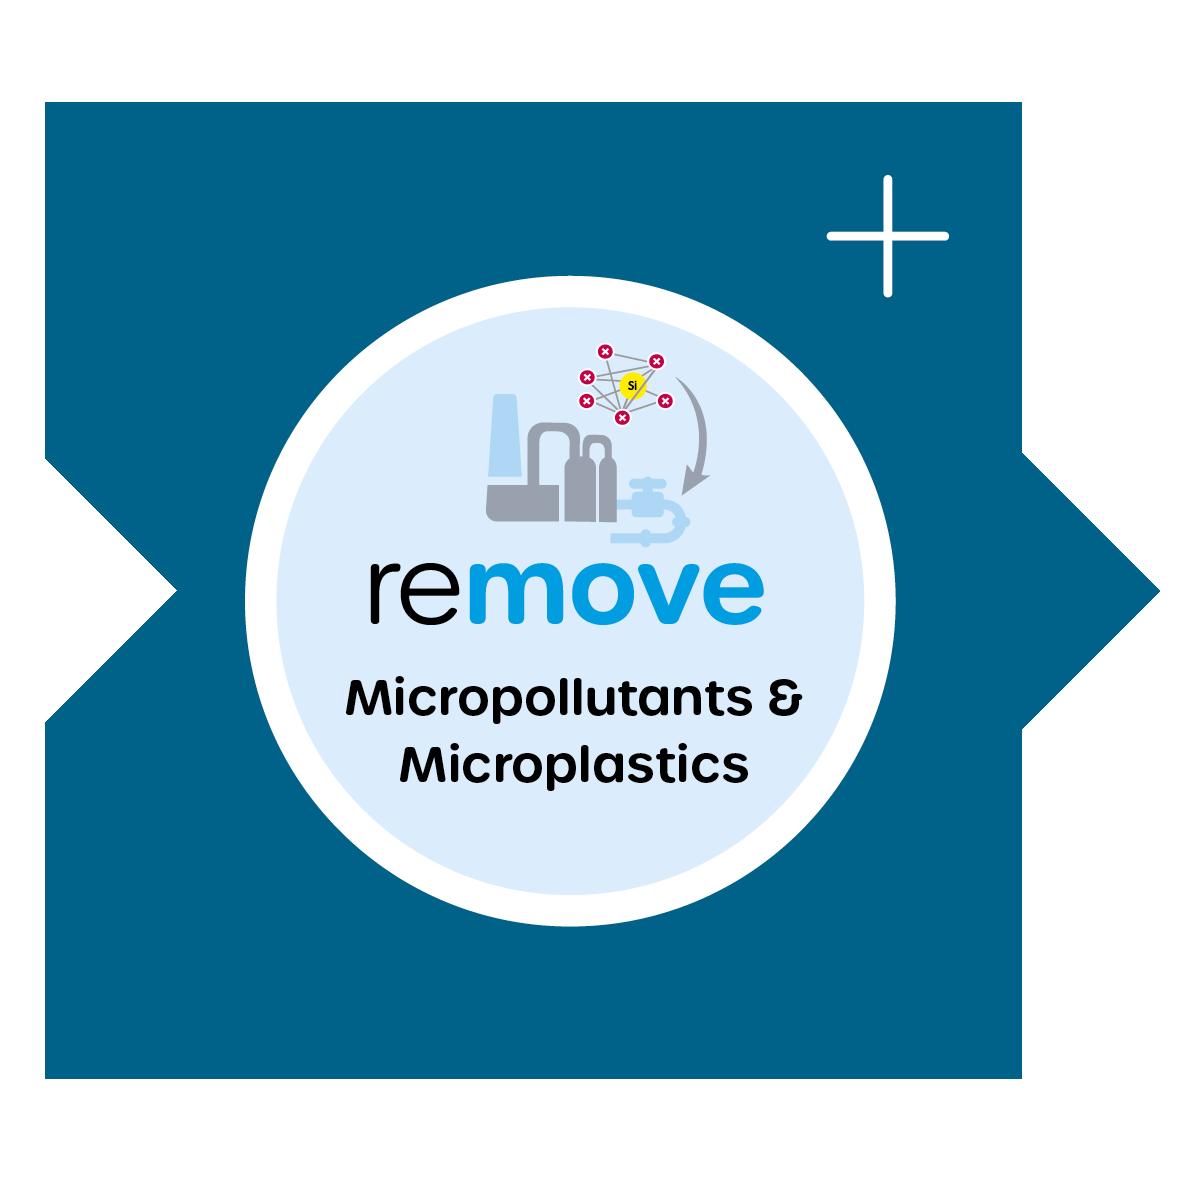 remove Micropollutants and microplastics / Mikroschadstoffe und Mikroplastik